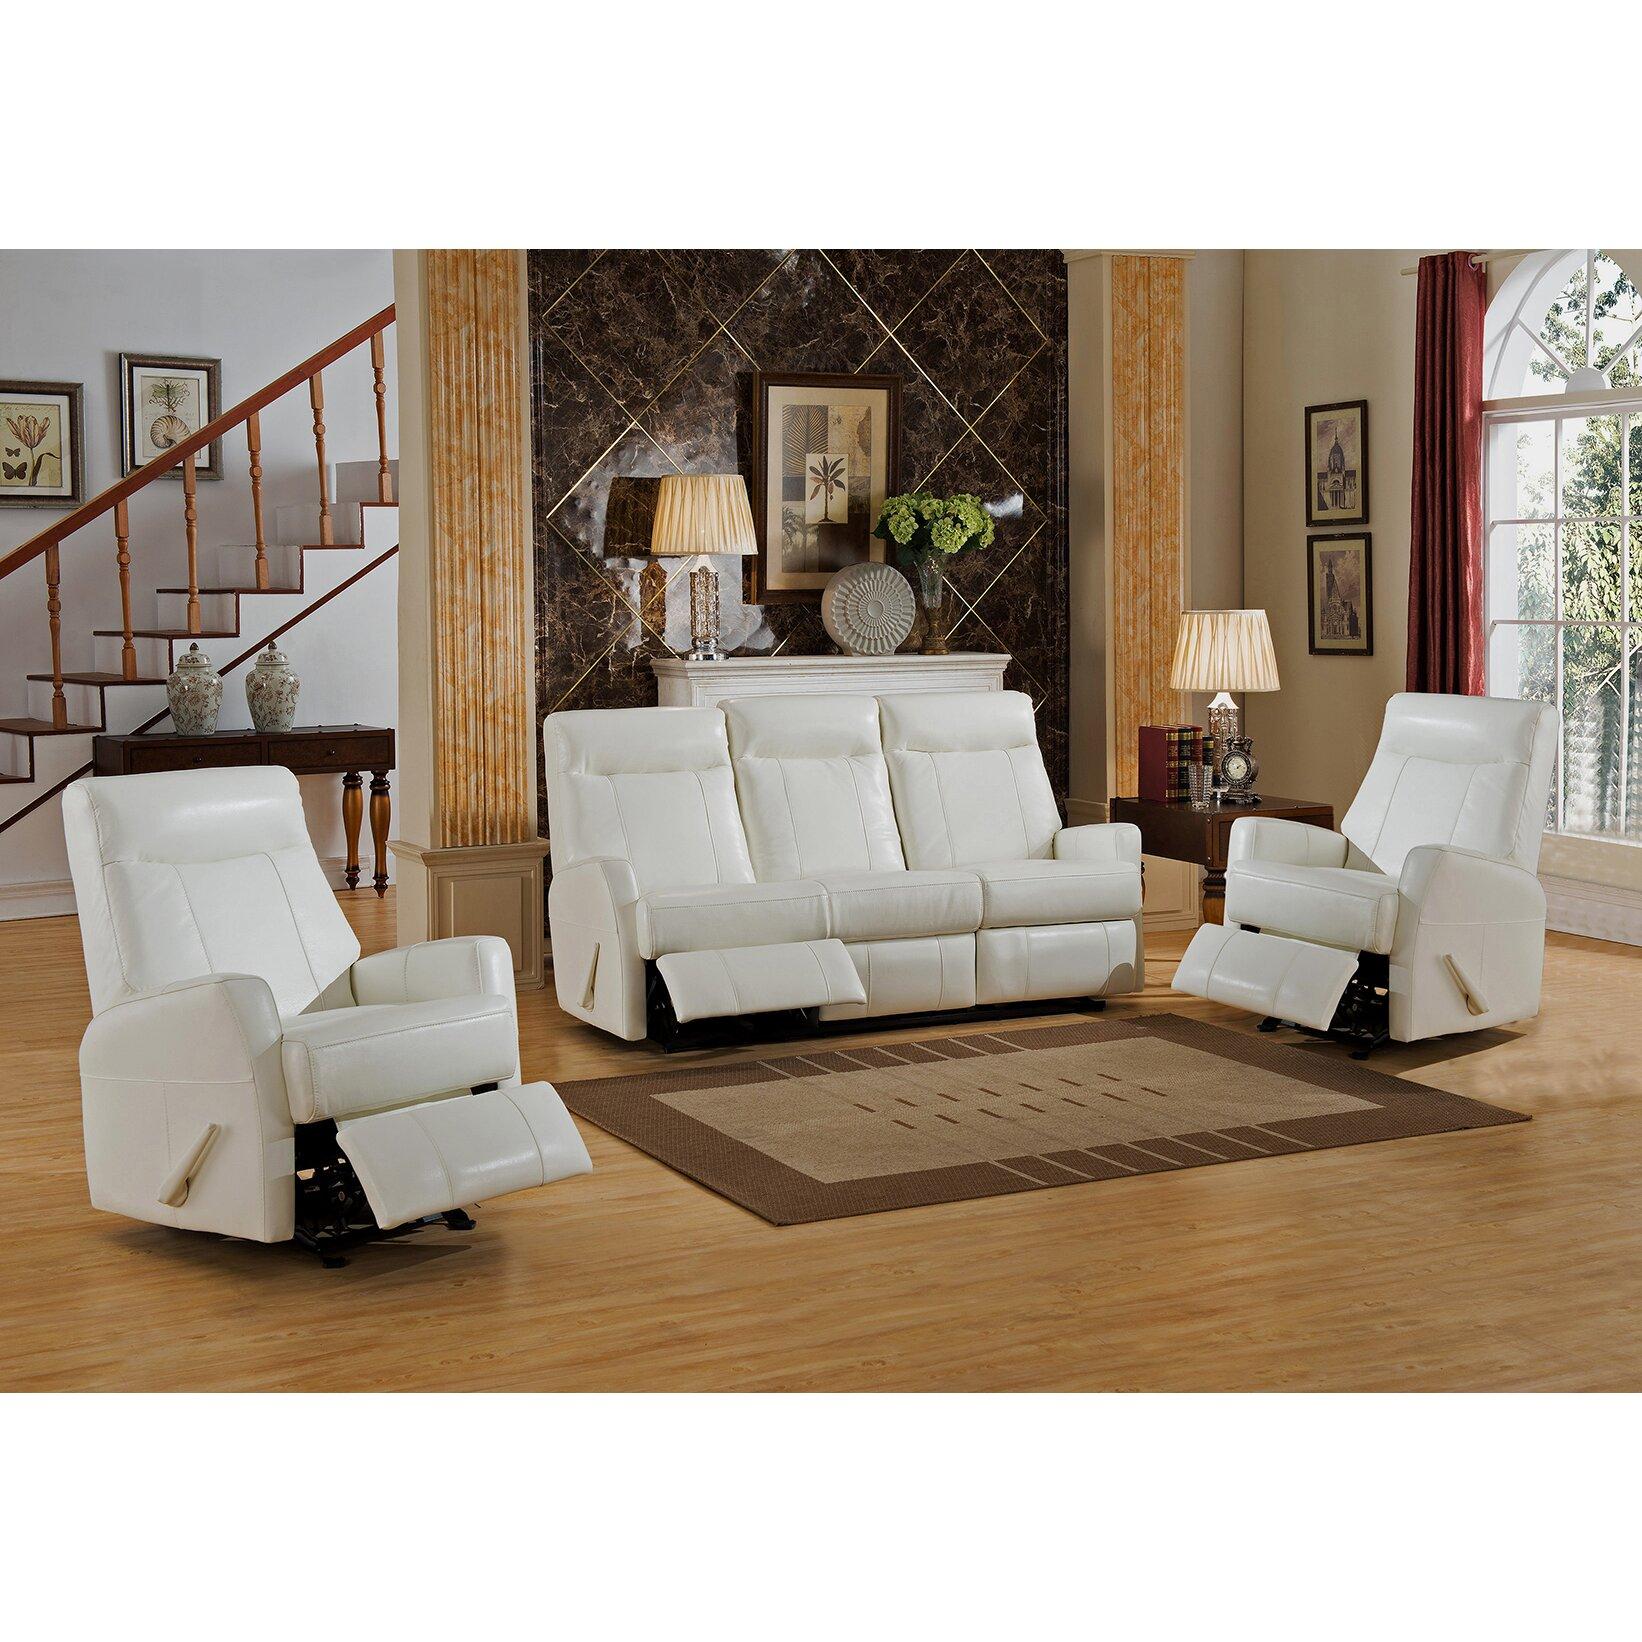 Amax toledo 3 piece leather living room set wayfair for 3 piece living room set